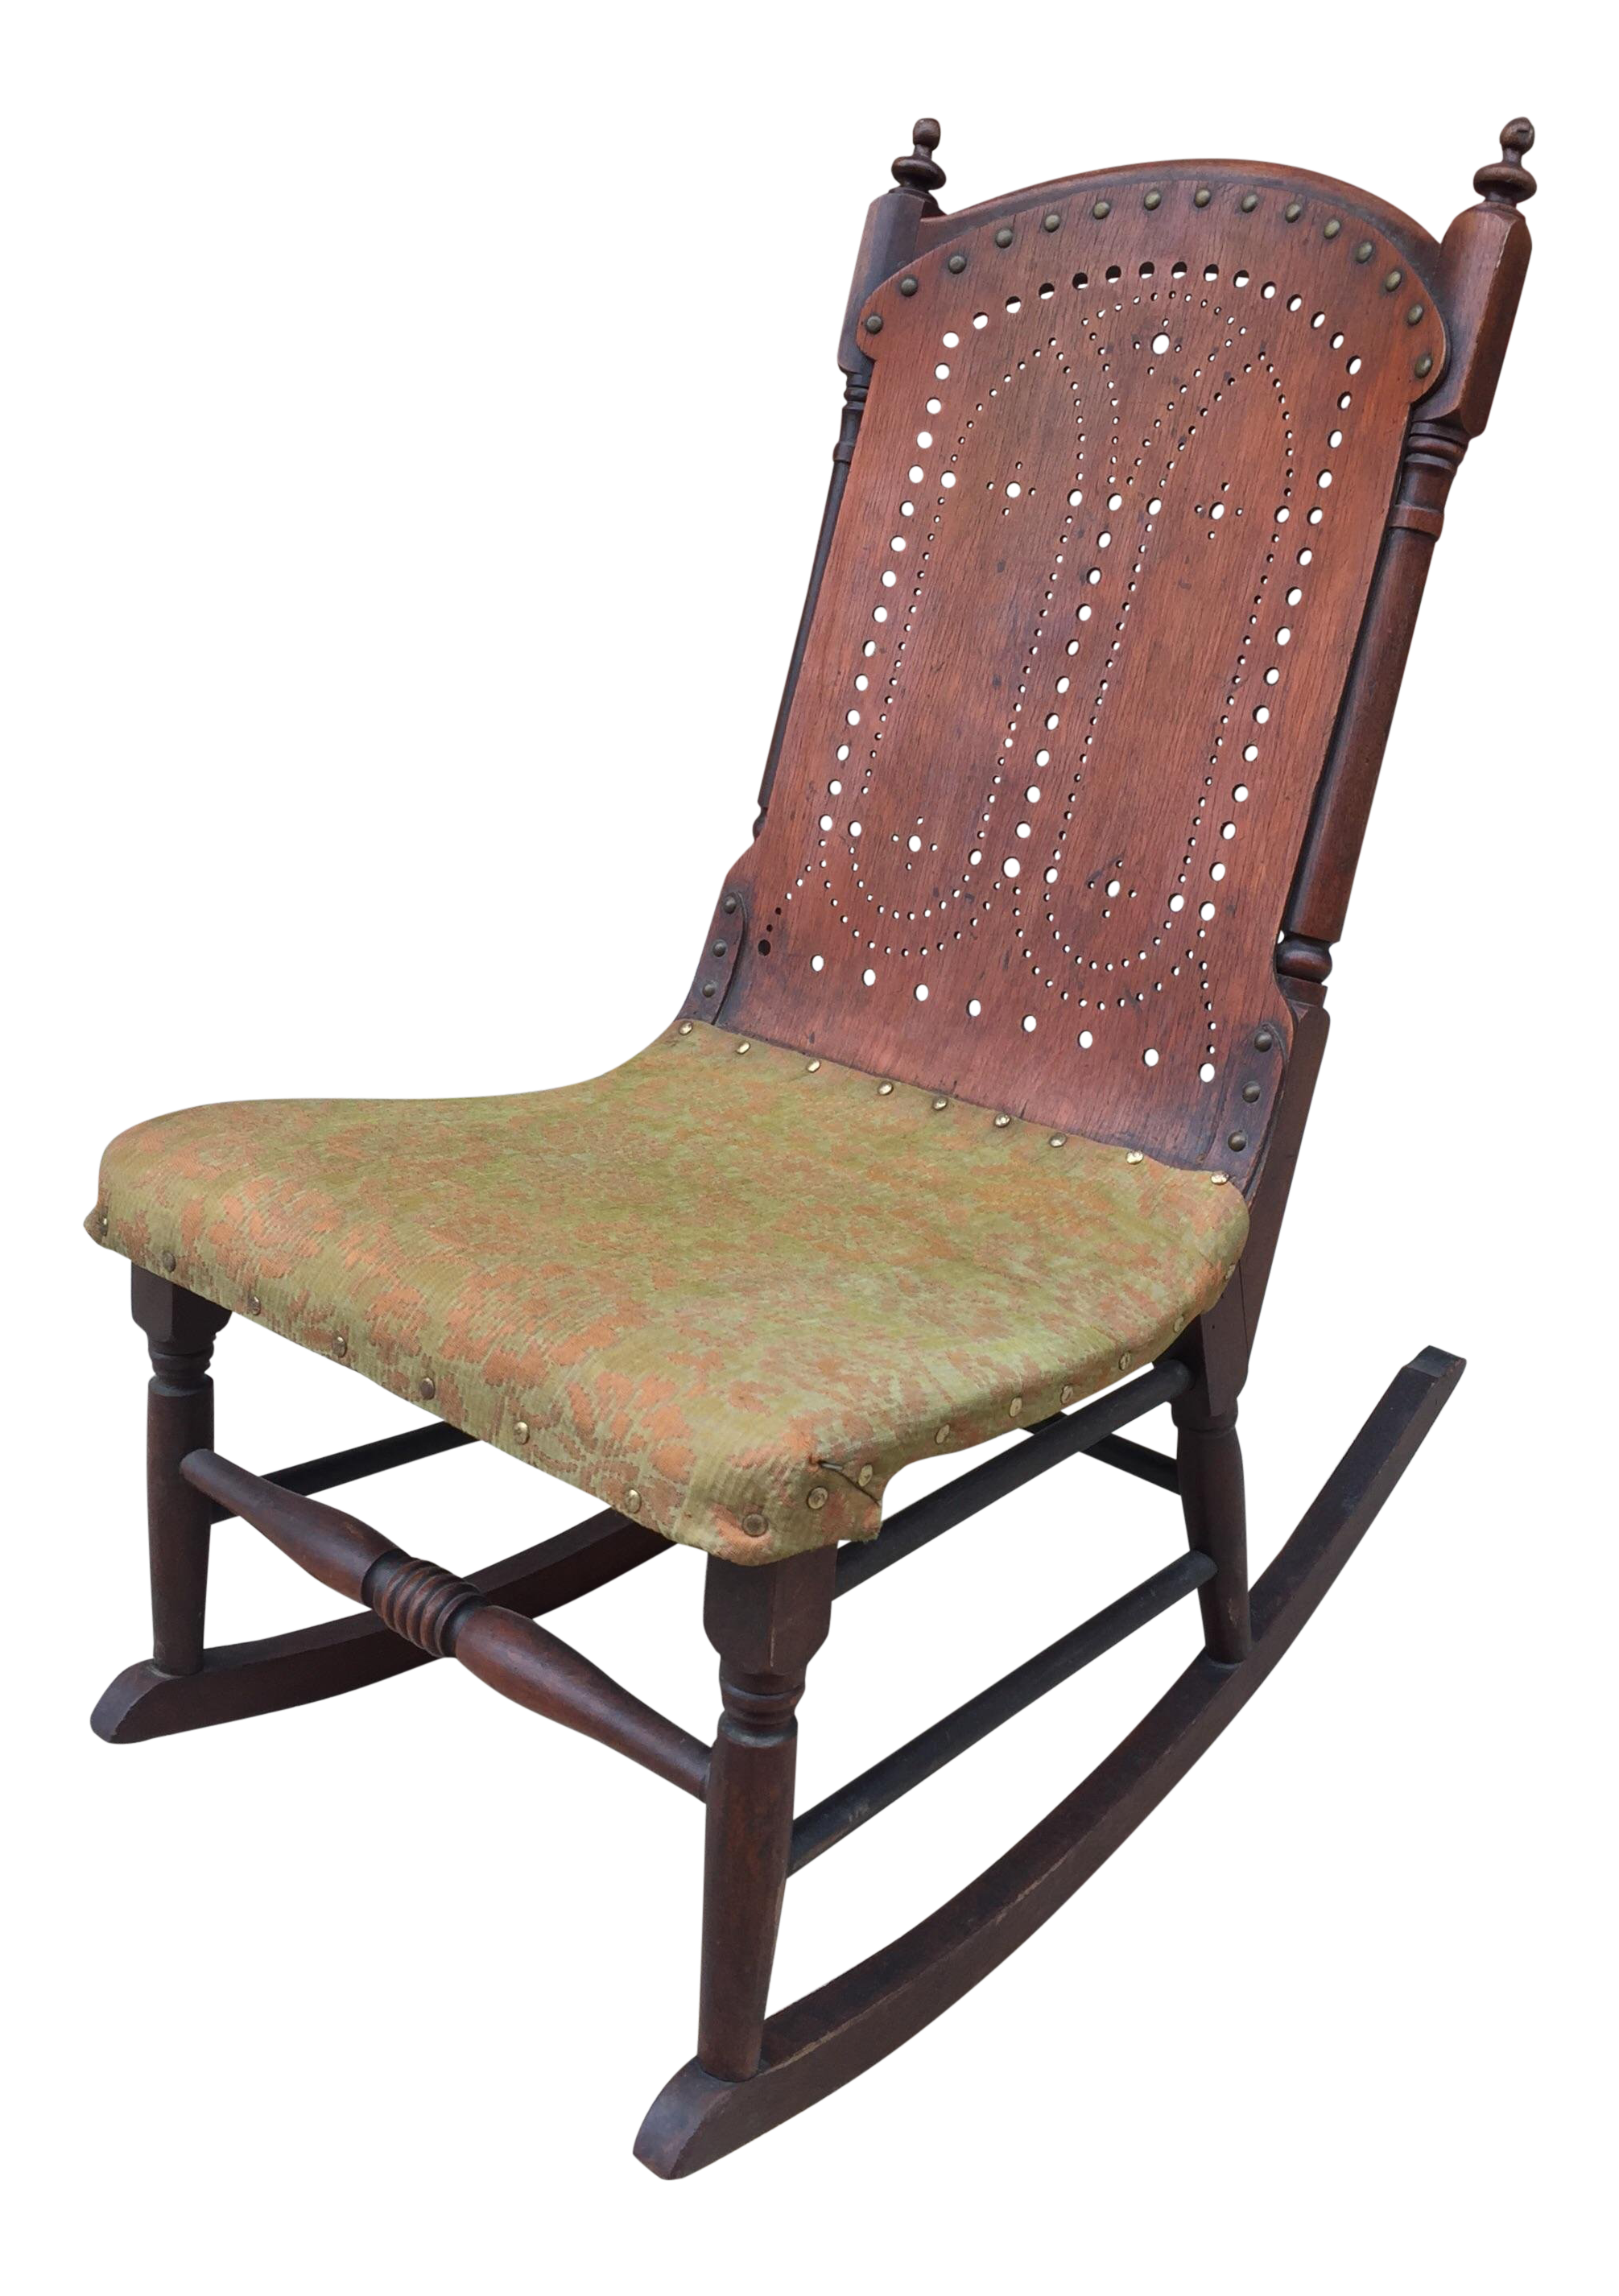 sc 1 st  Chairish & Late 19th Century Antique Victorian Childu0027s Rocking Chair   Chairish